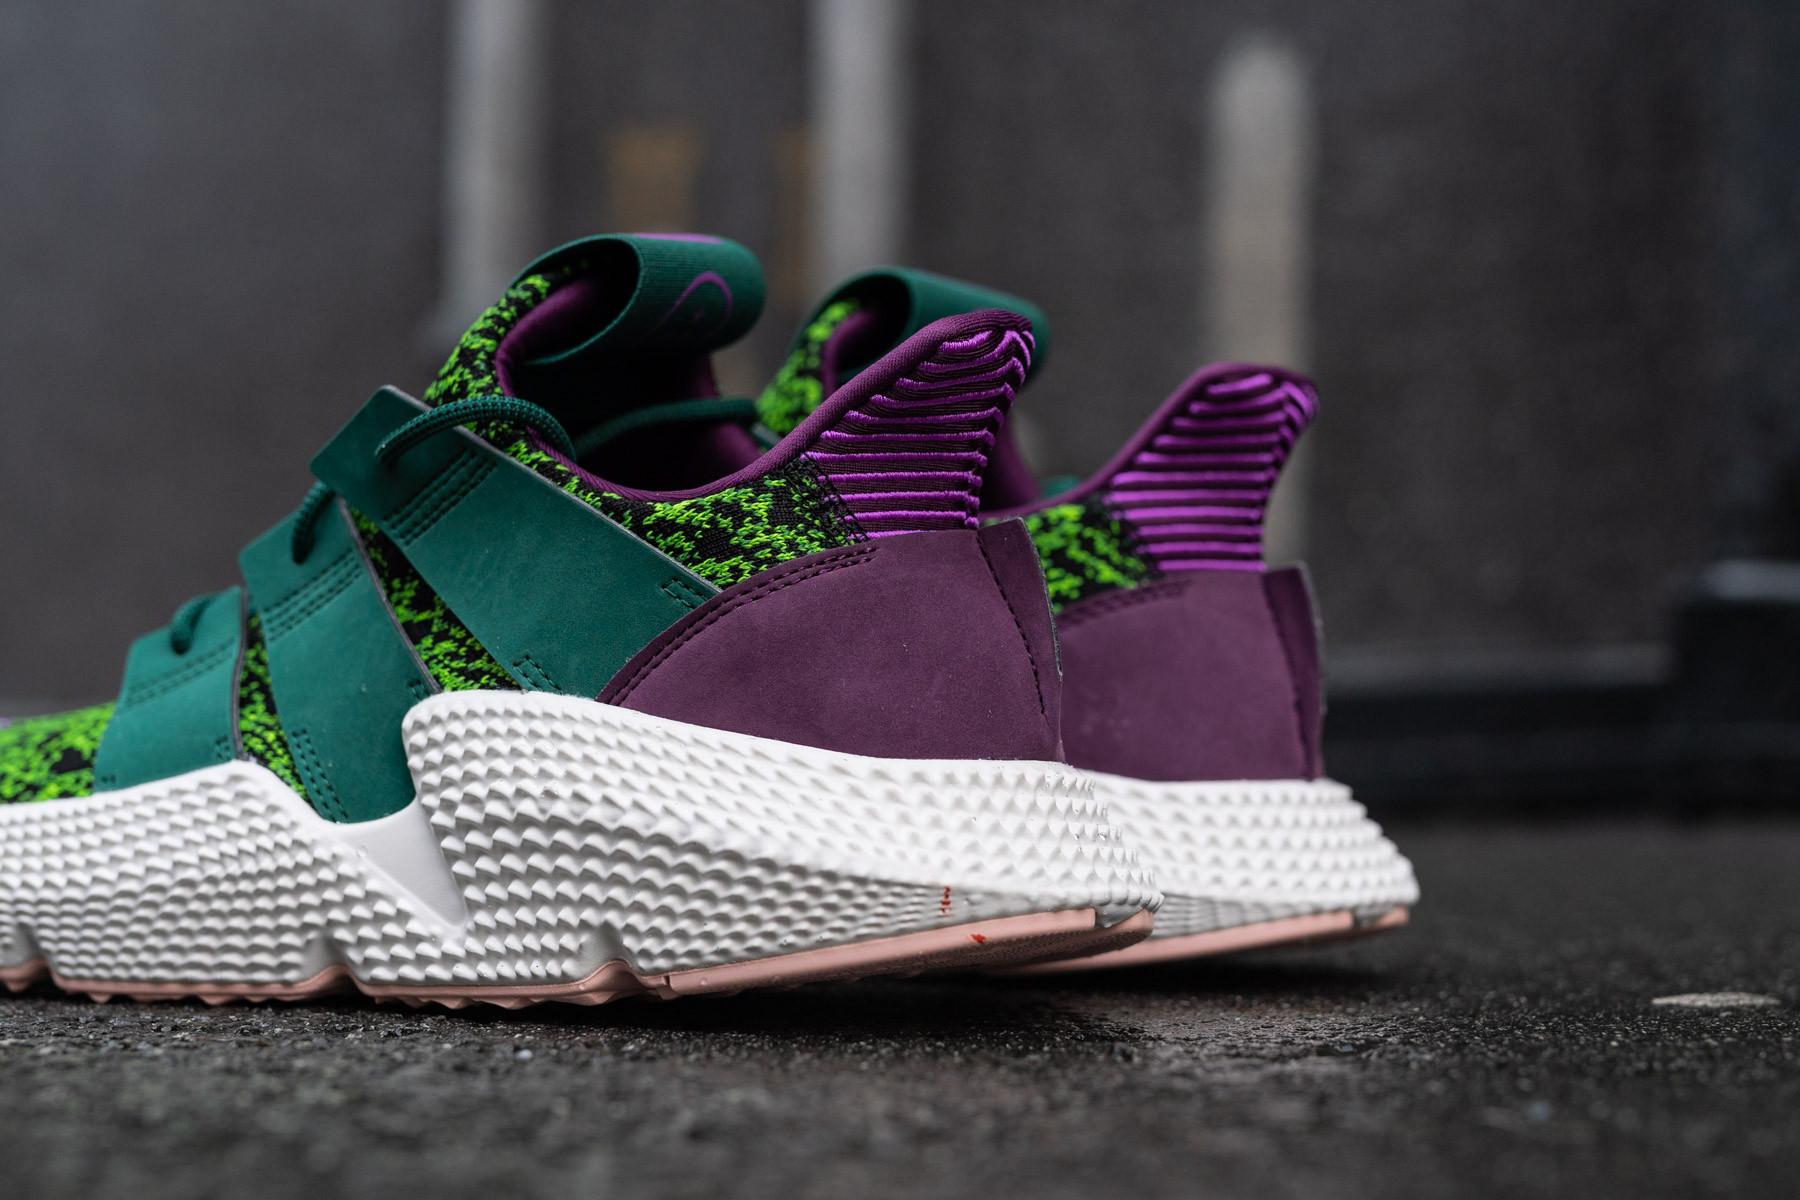 adidas dragon ball collection